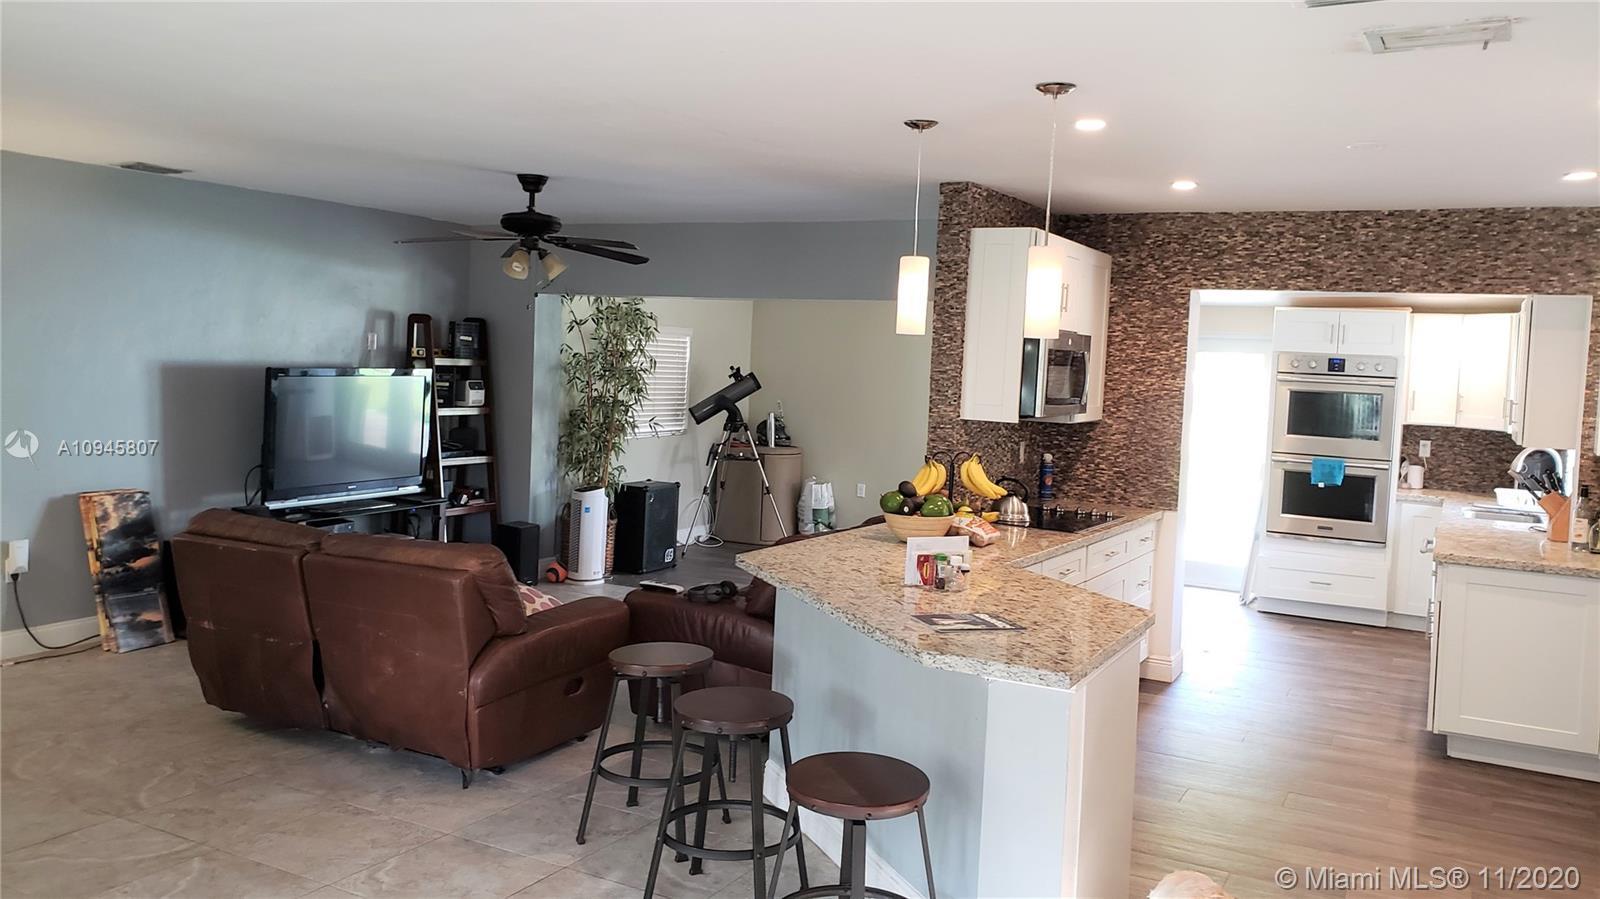 12900 SW 82nd Pl, Pinecrest, Florida 33156, 4 Bedrooms Bedrooms, ,3 BathroomsBathrooms,Residential,For Sale,12900 SW 82nd Pl,A10945807